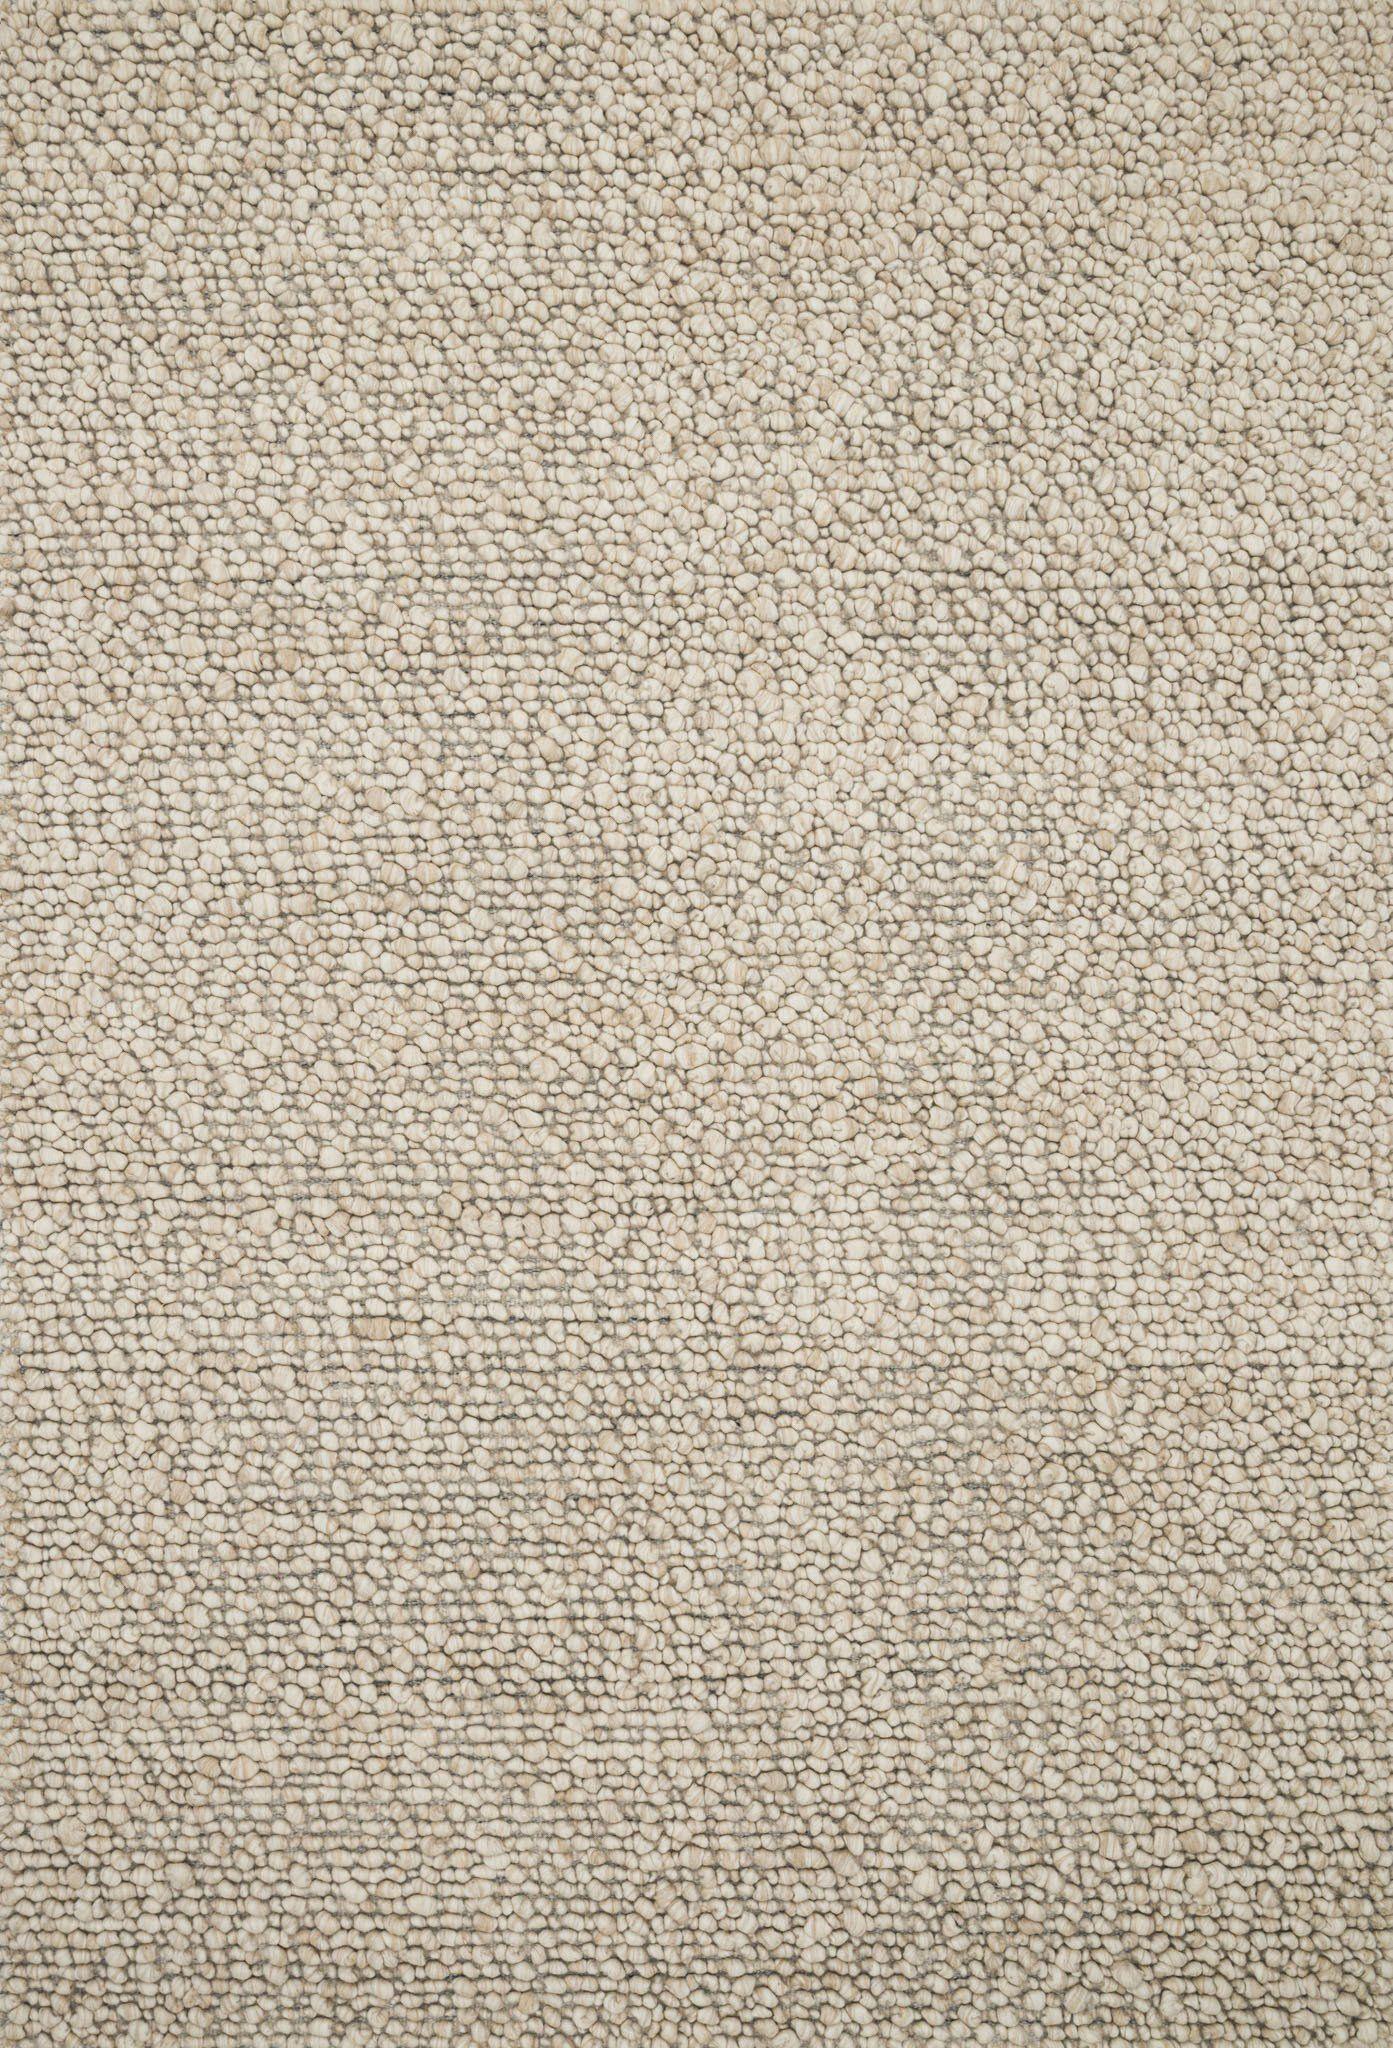 Sphinx Mantra Area Rug 003x7 Grey Petals Vines 7 10 Quot X 10 10 Quot Rectangle In 2020 Oriental Weavers Area Rugs Rugs